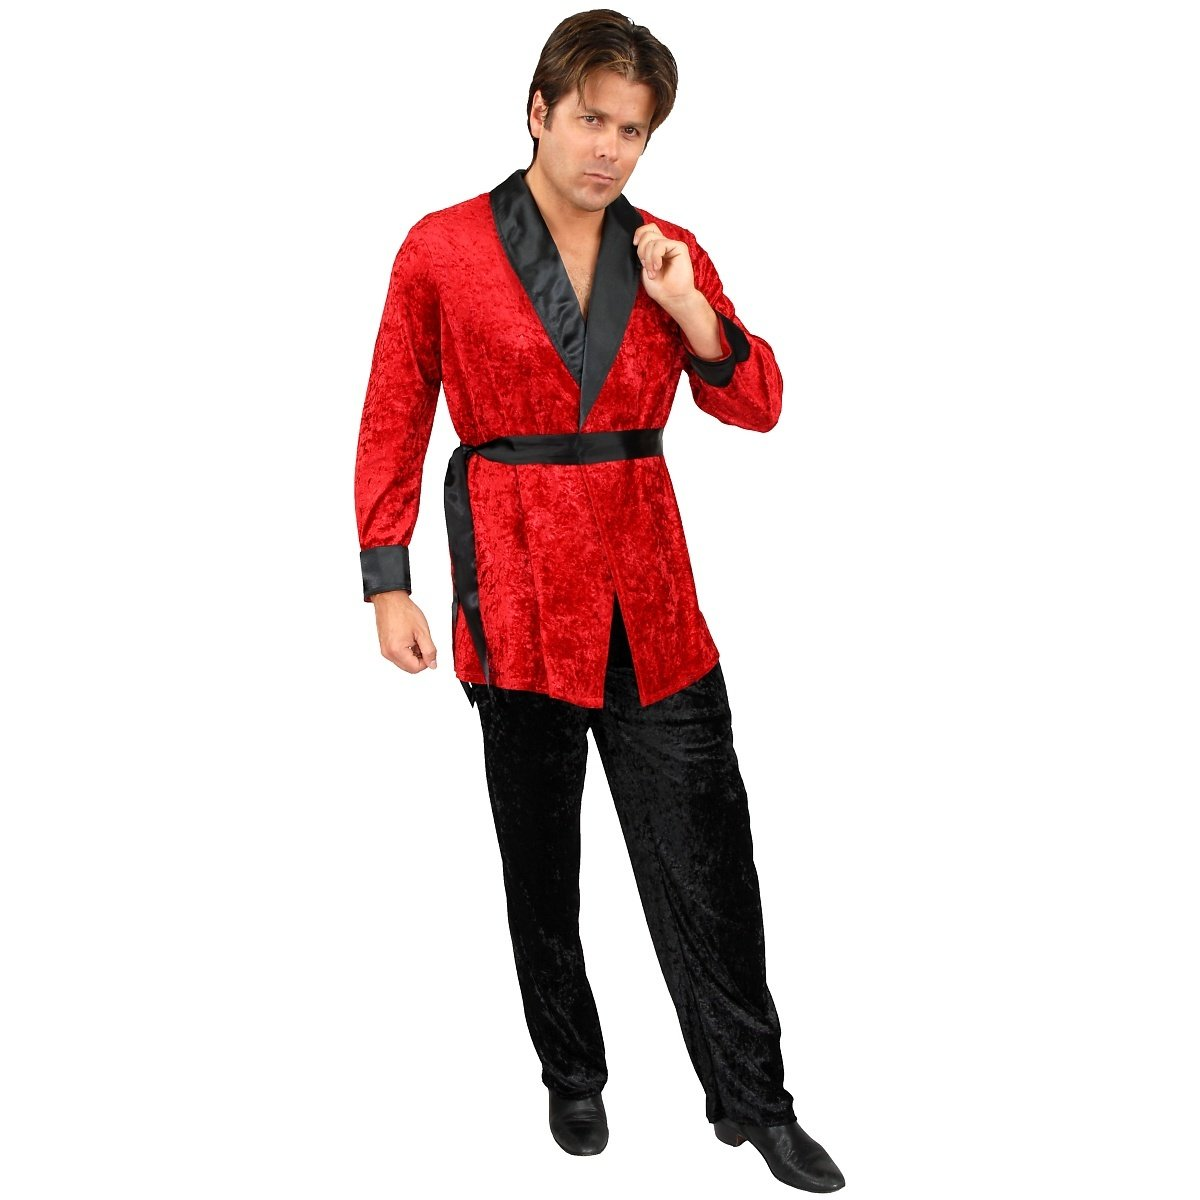 Red Smoking Jacket Adult Costume - X-Large